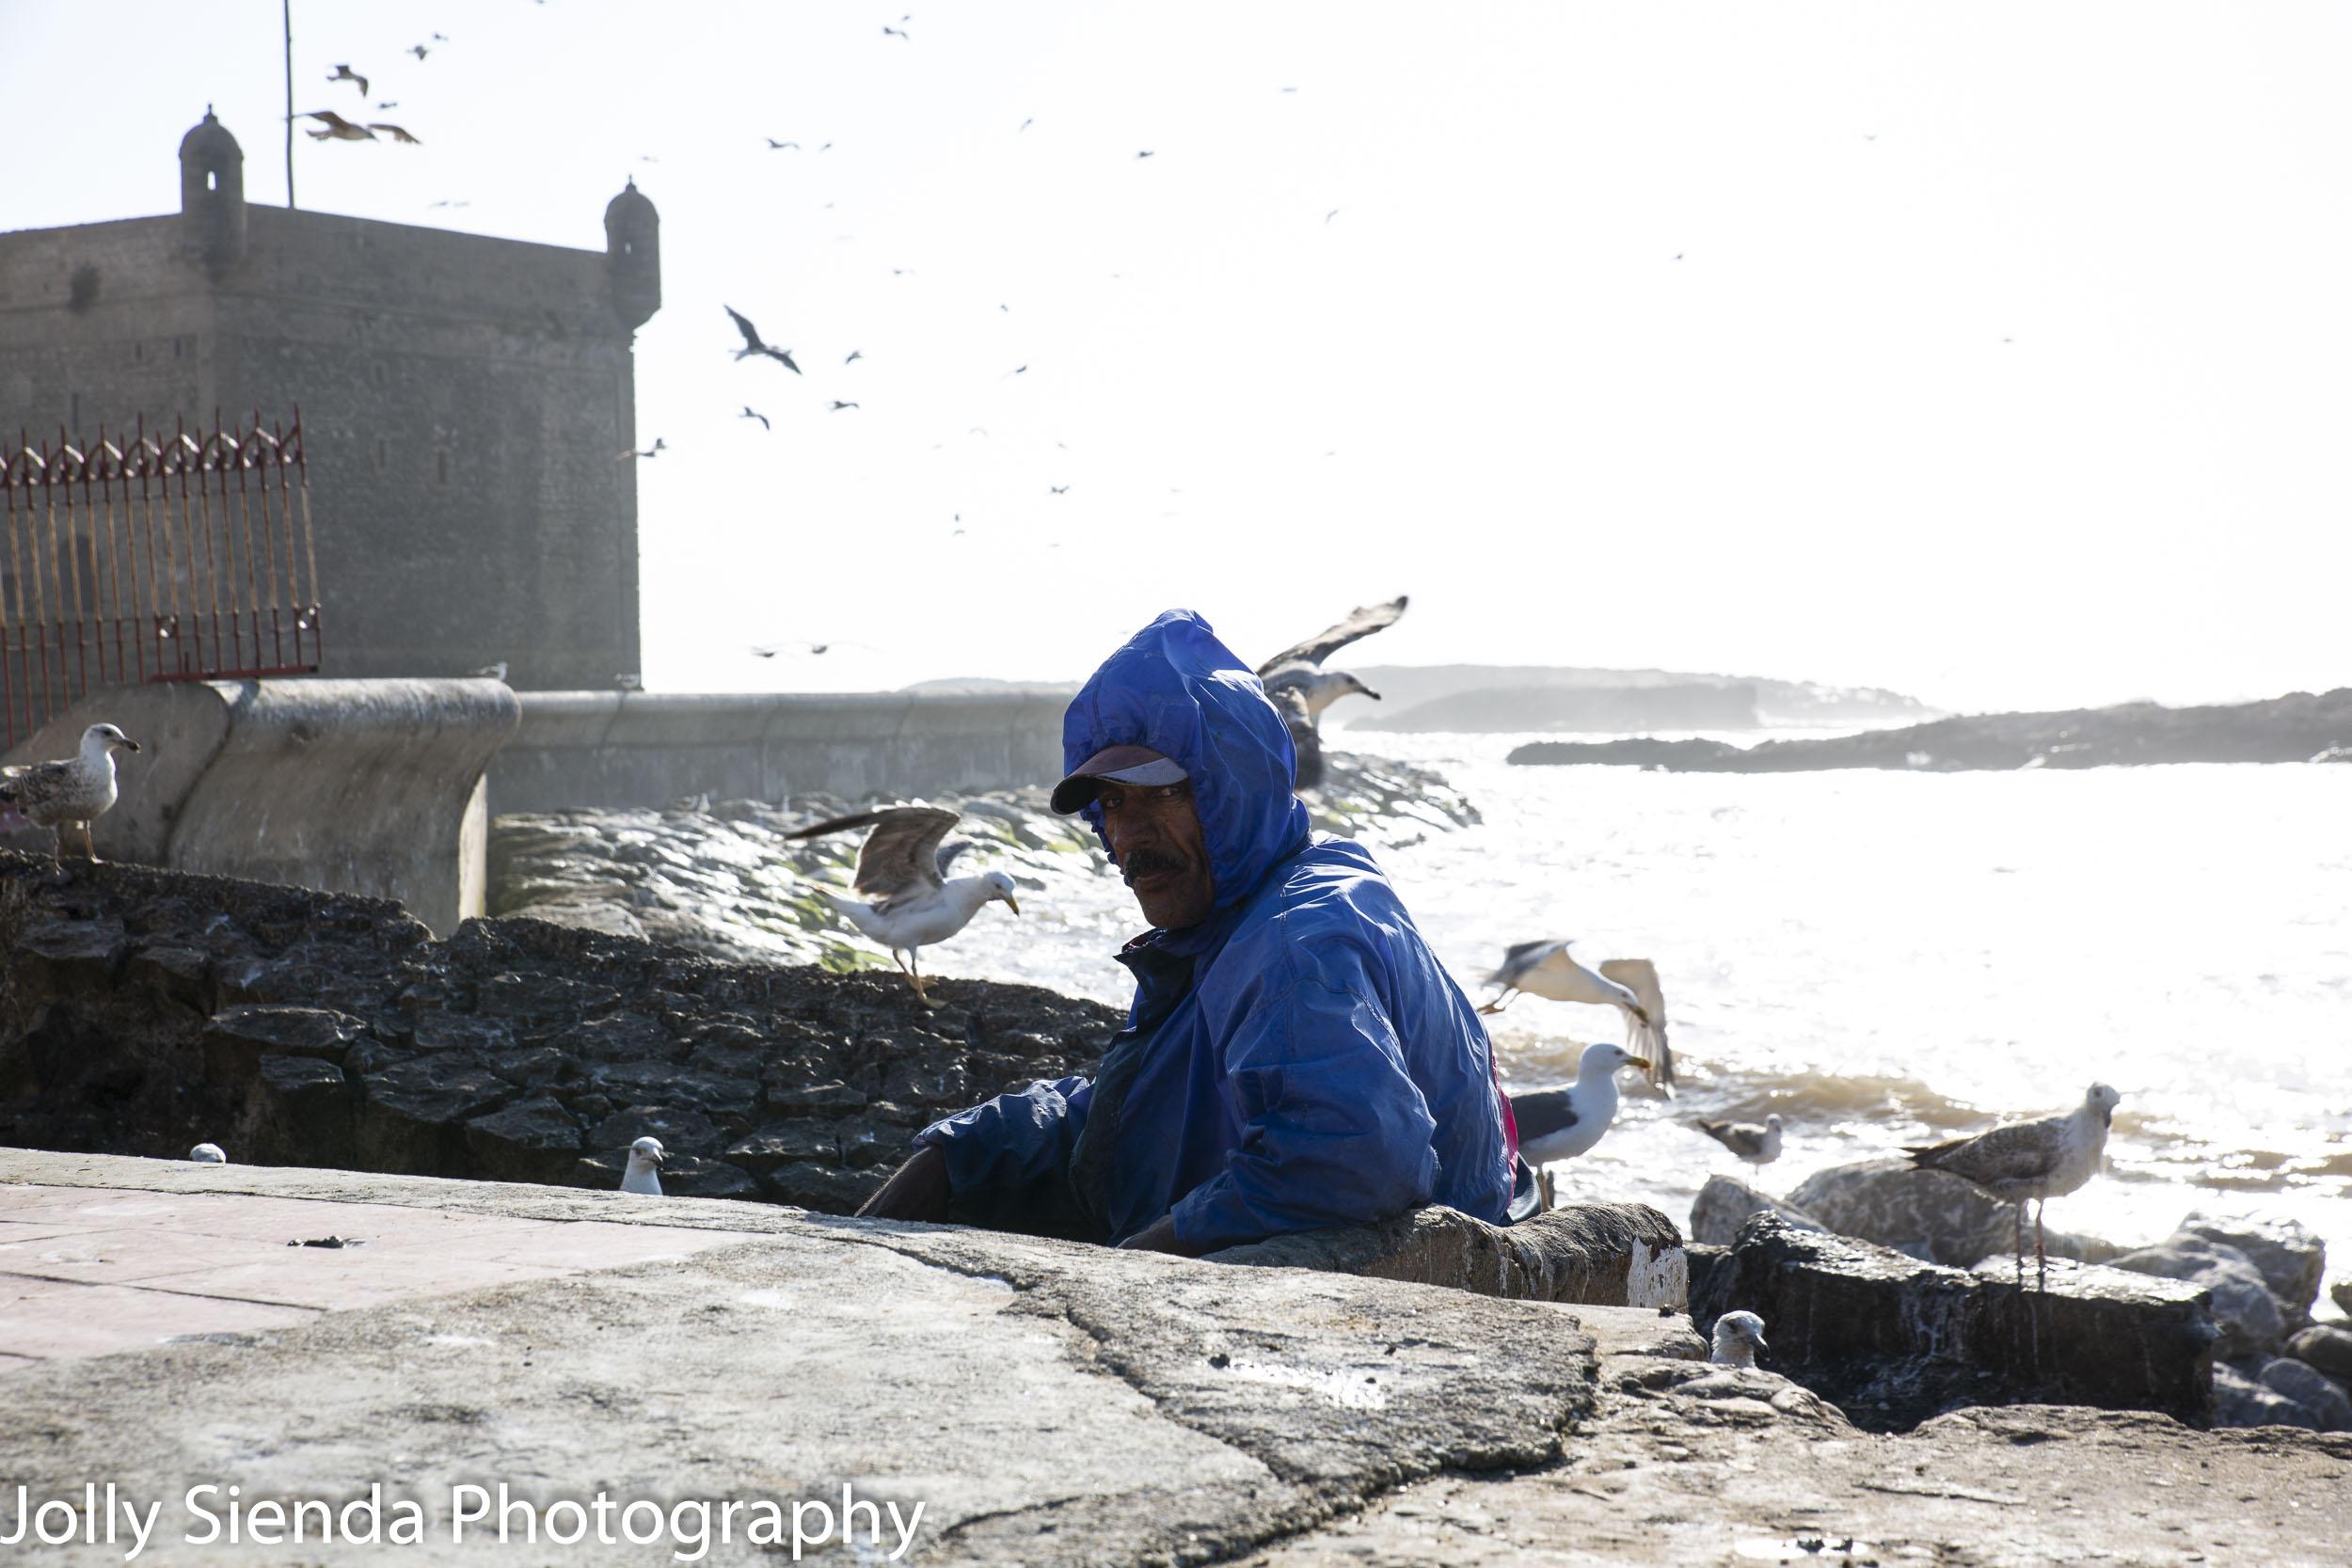 Fisherman wears blue raincoat at Essaouira fishing port